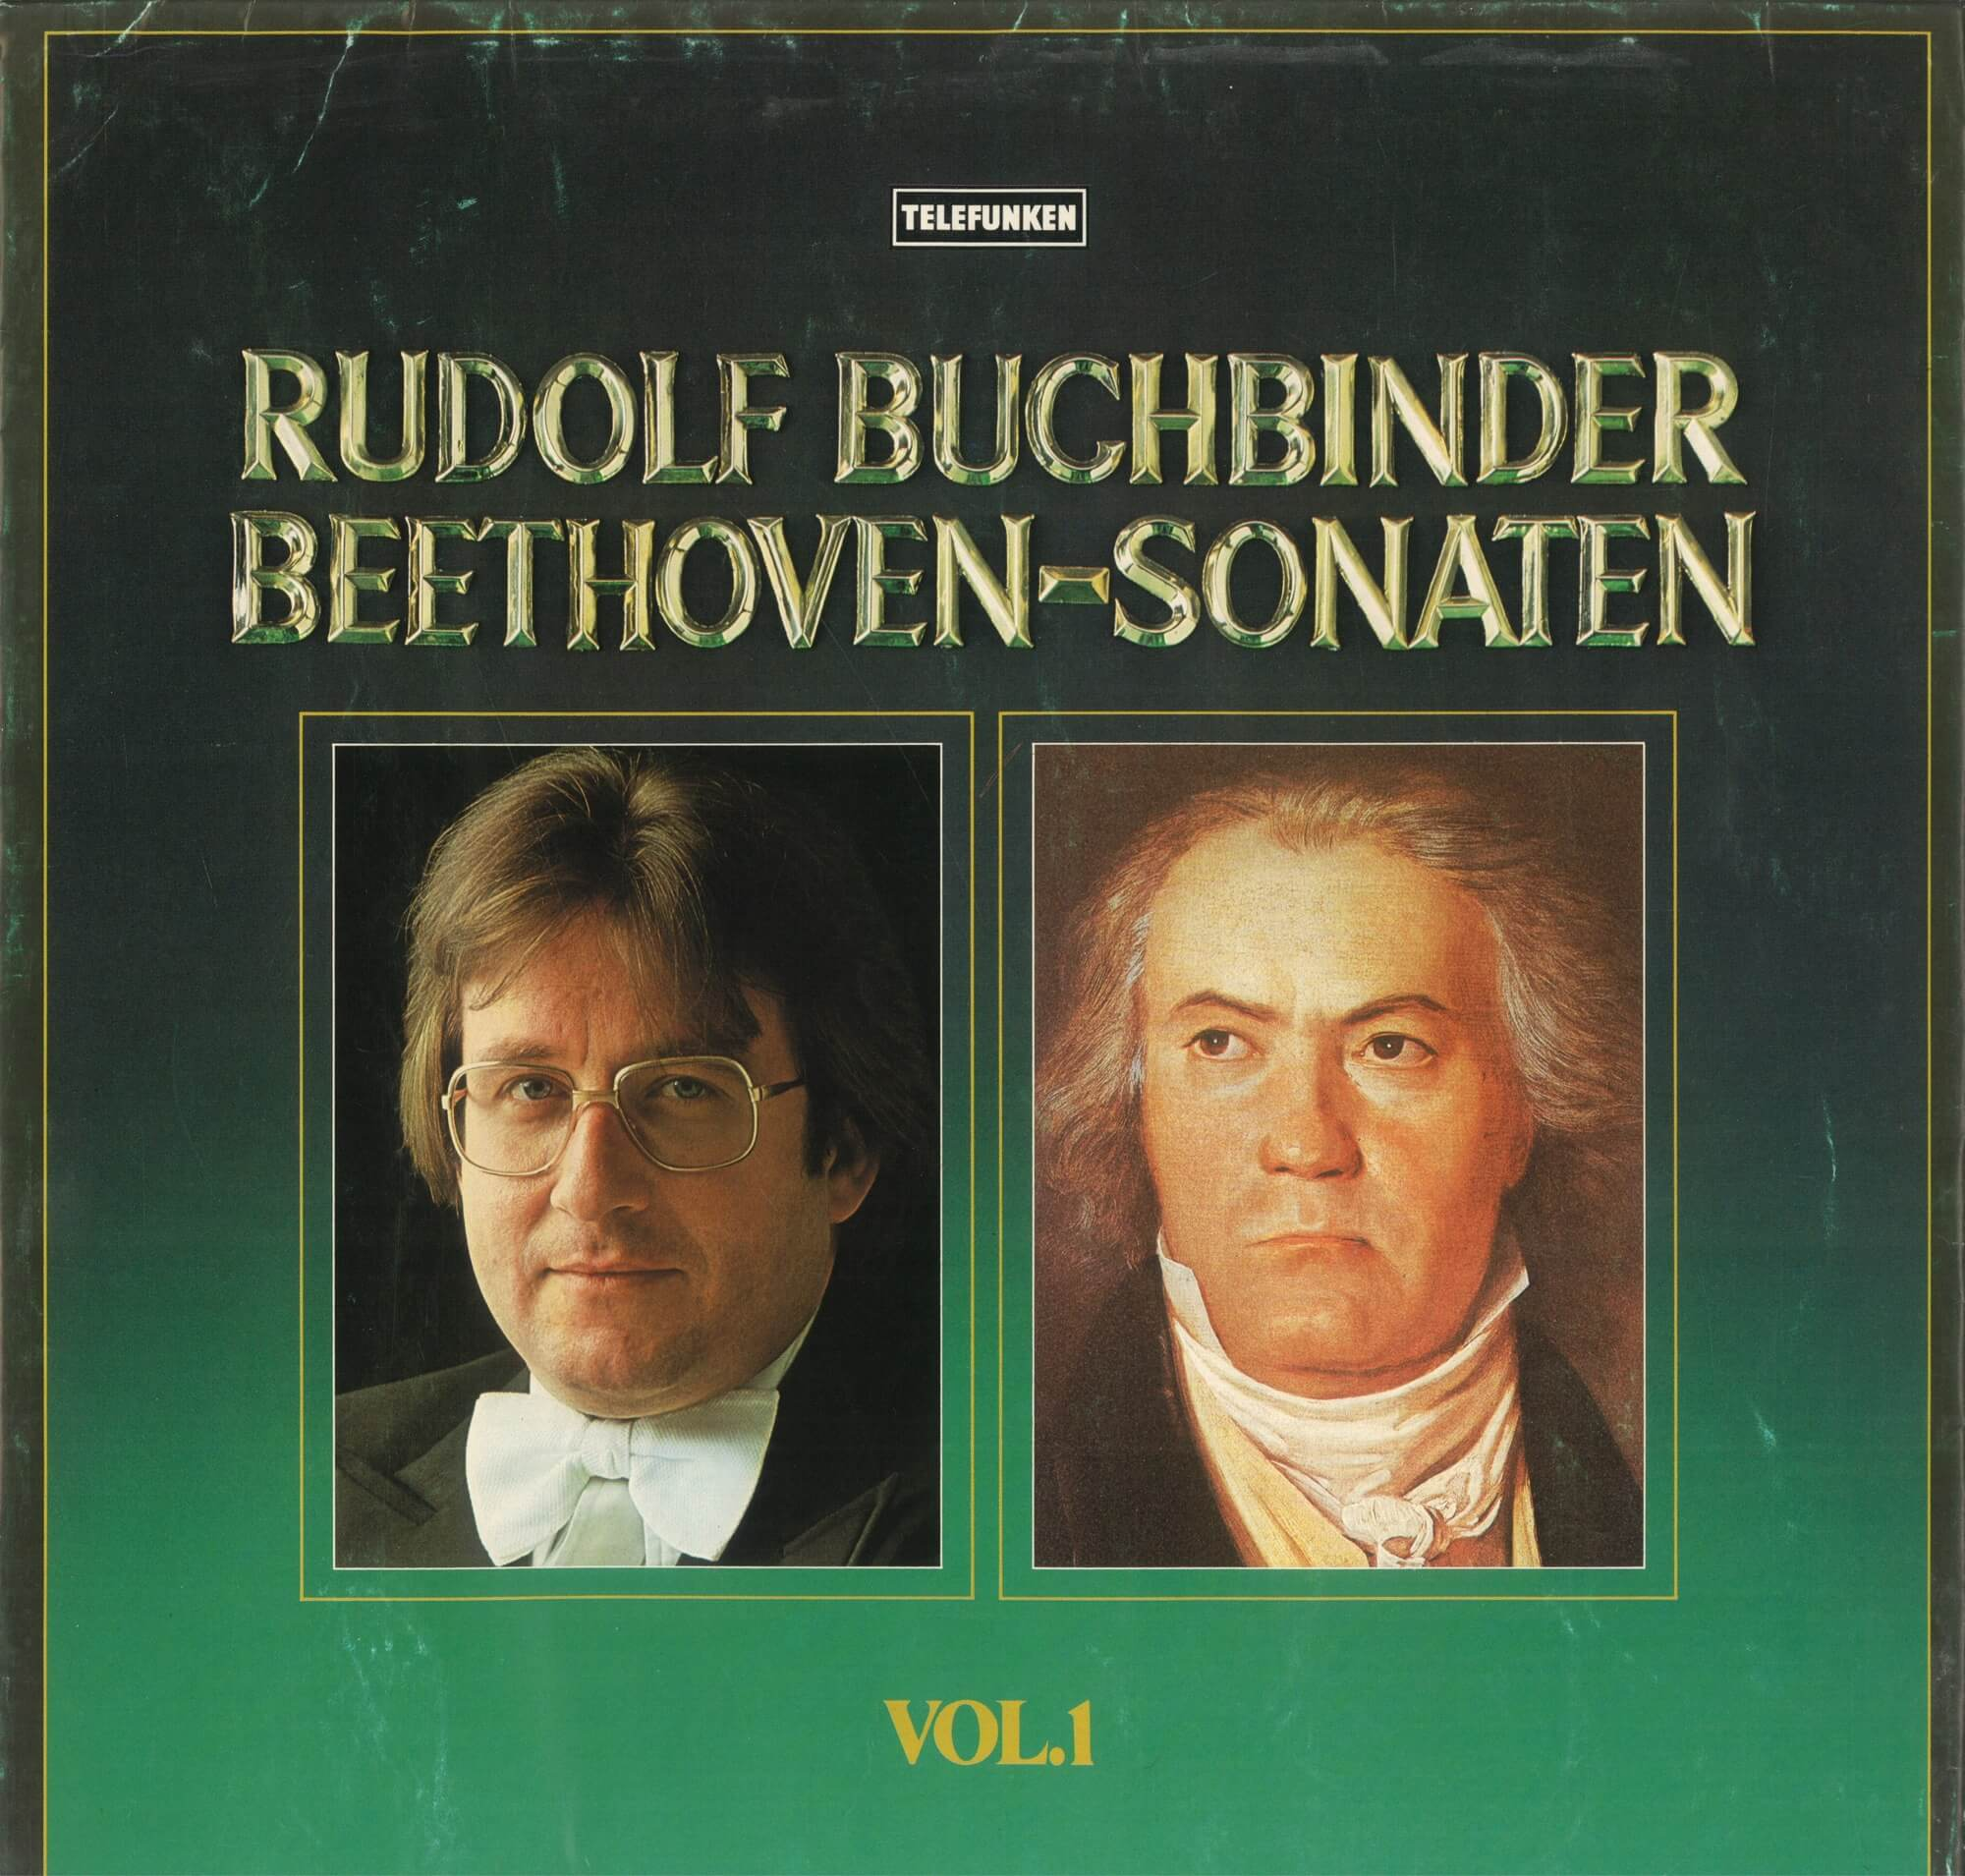 LP Cover Beethoven Sonaten Zyklus Vol 1.jpg